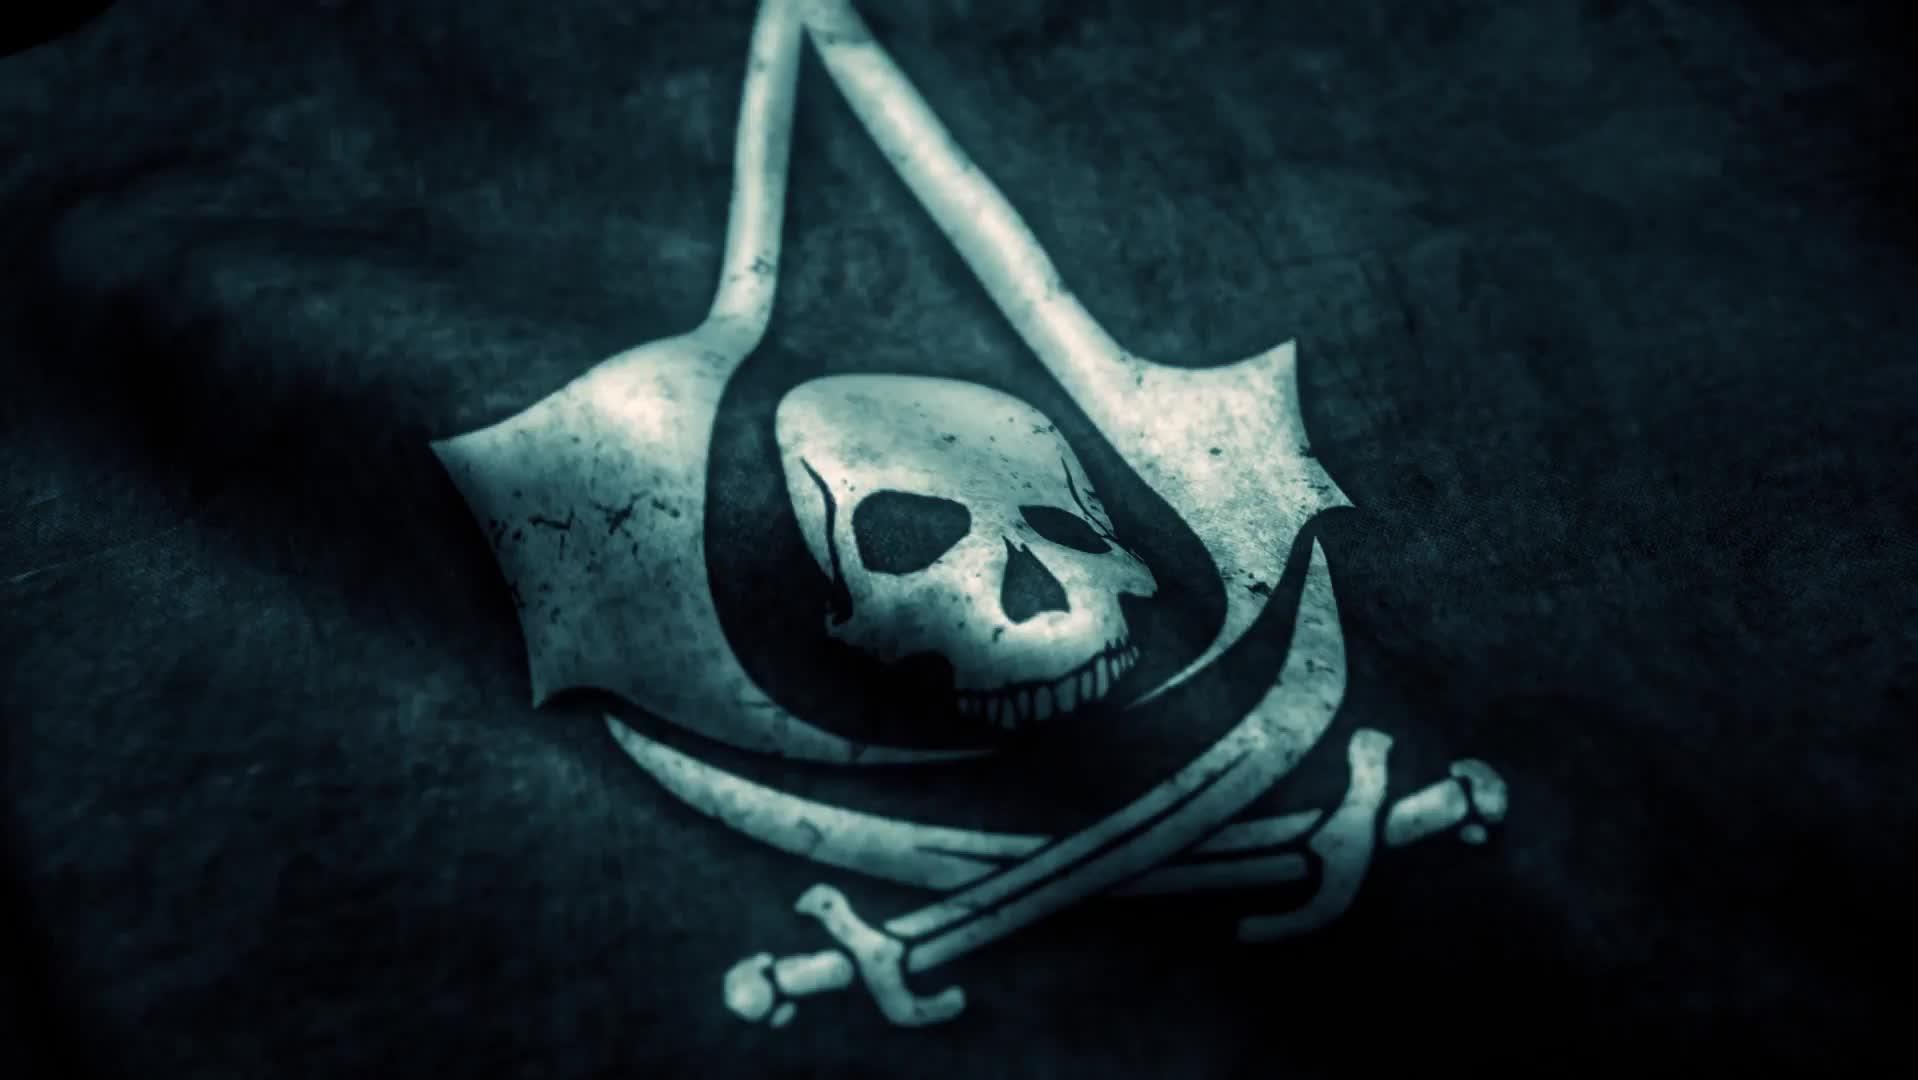 Assassin's Creed флаг - живые обои